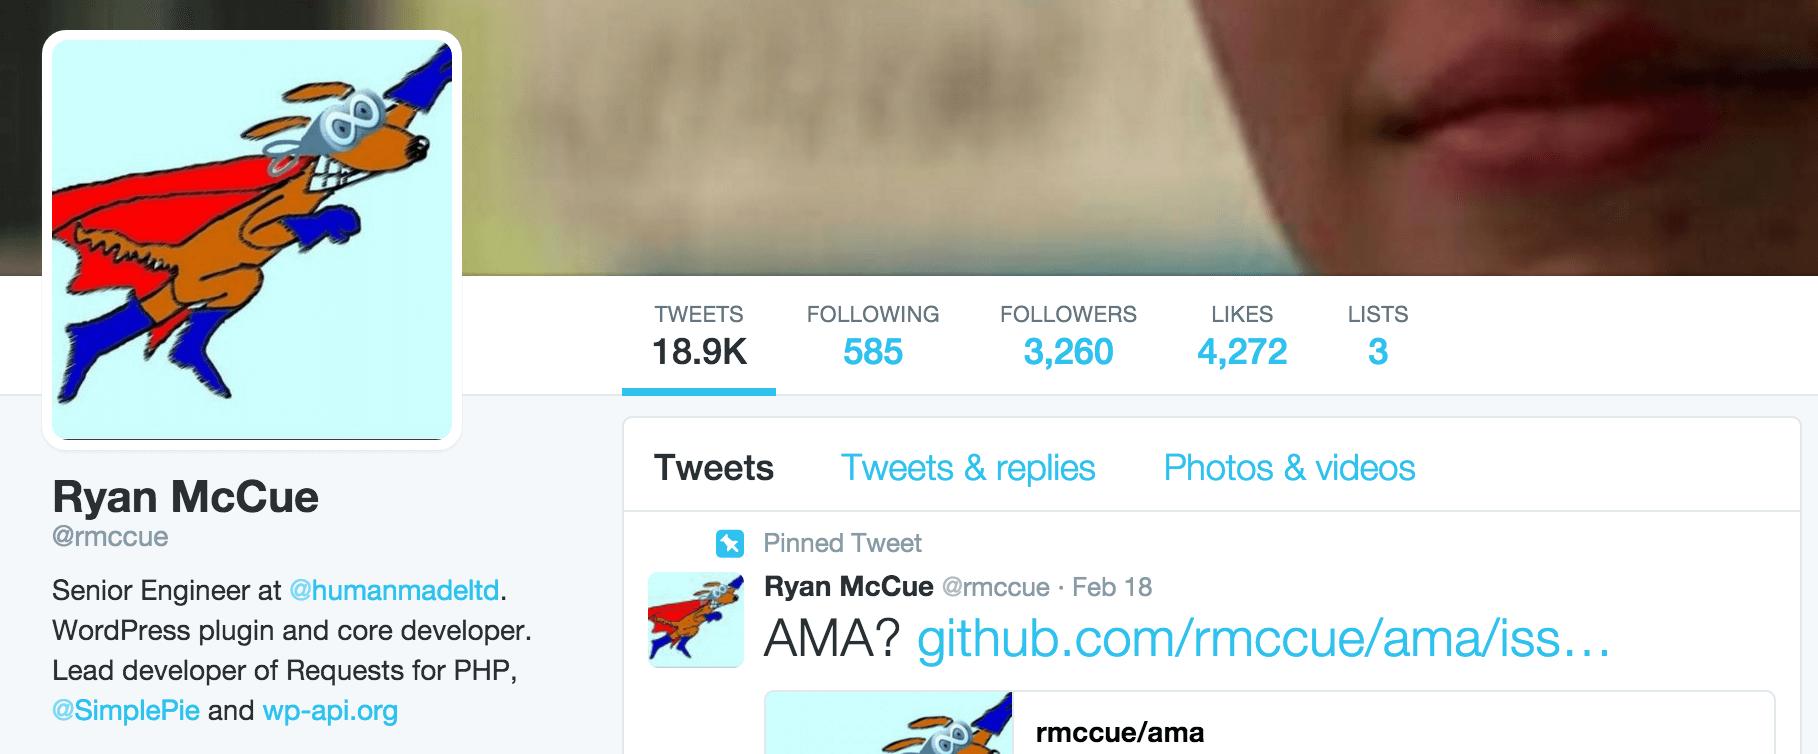 Ryan McCue